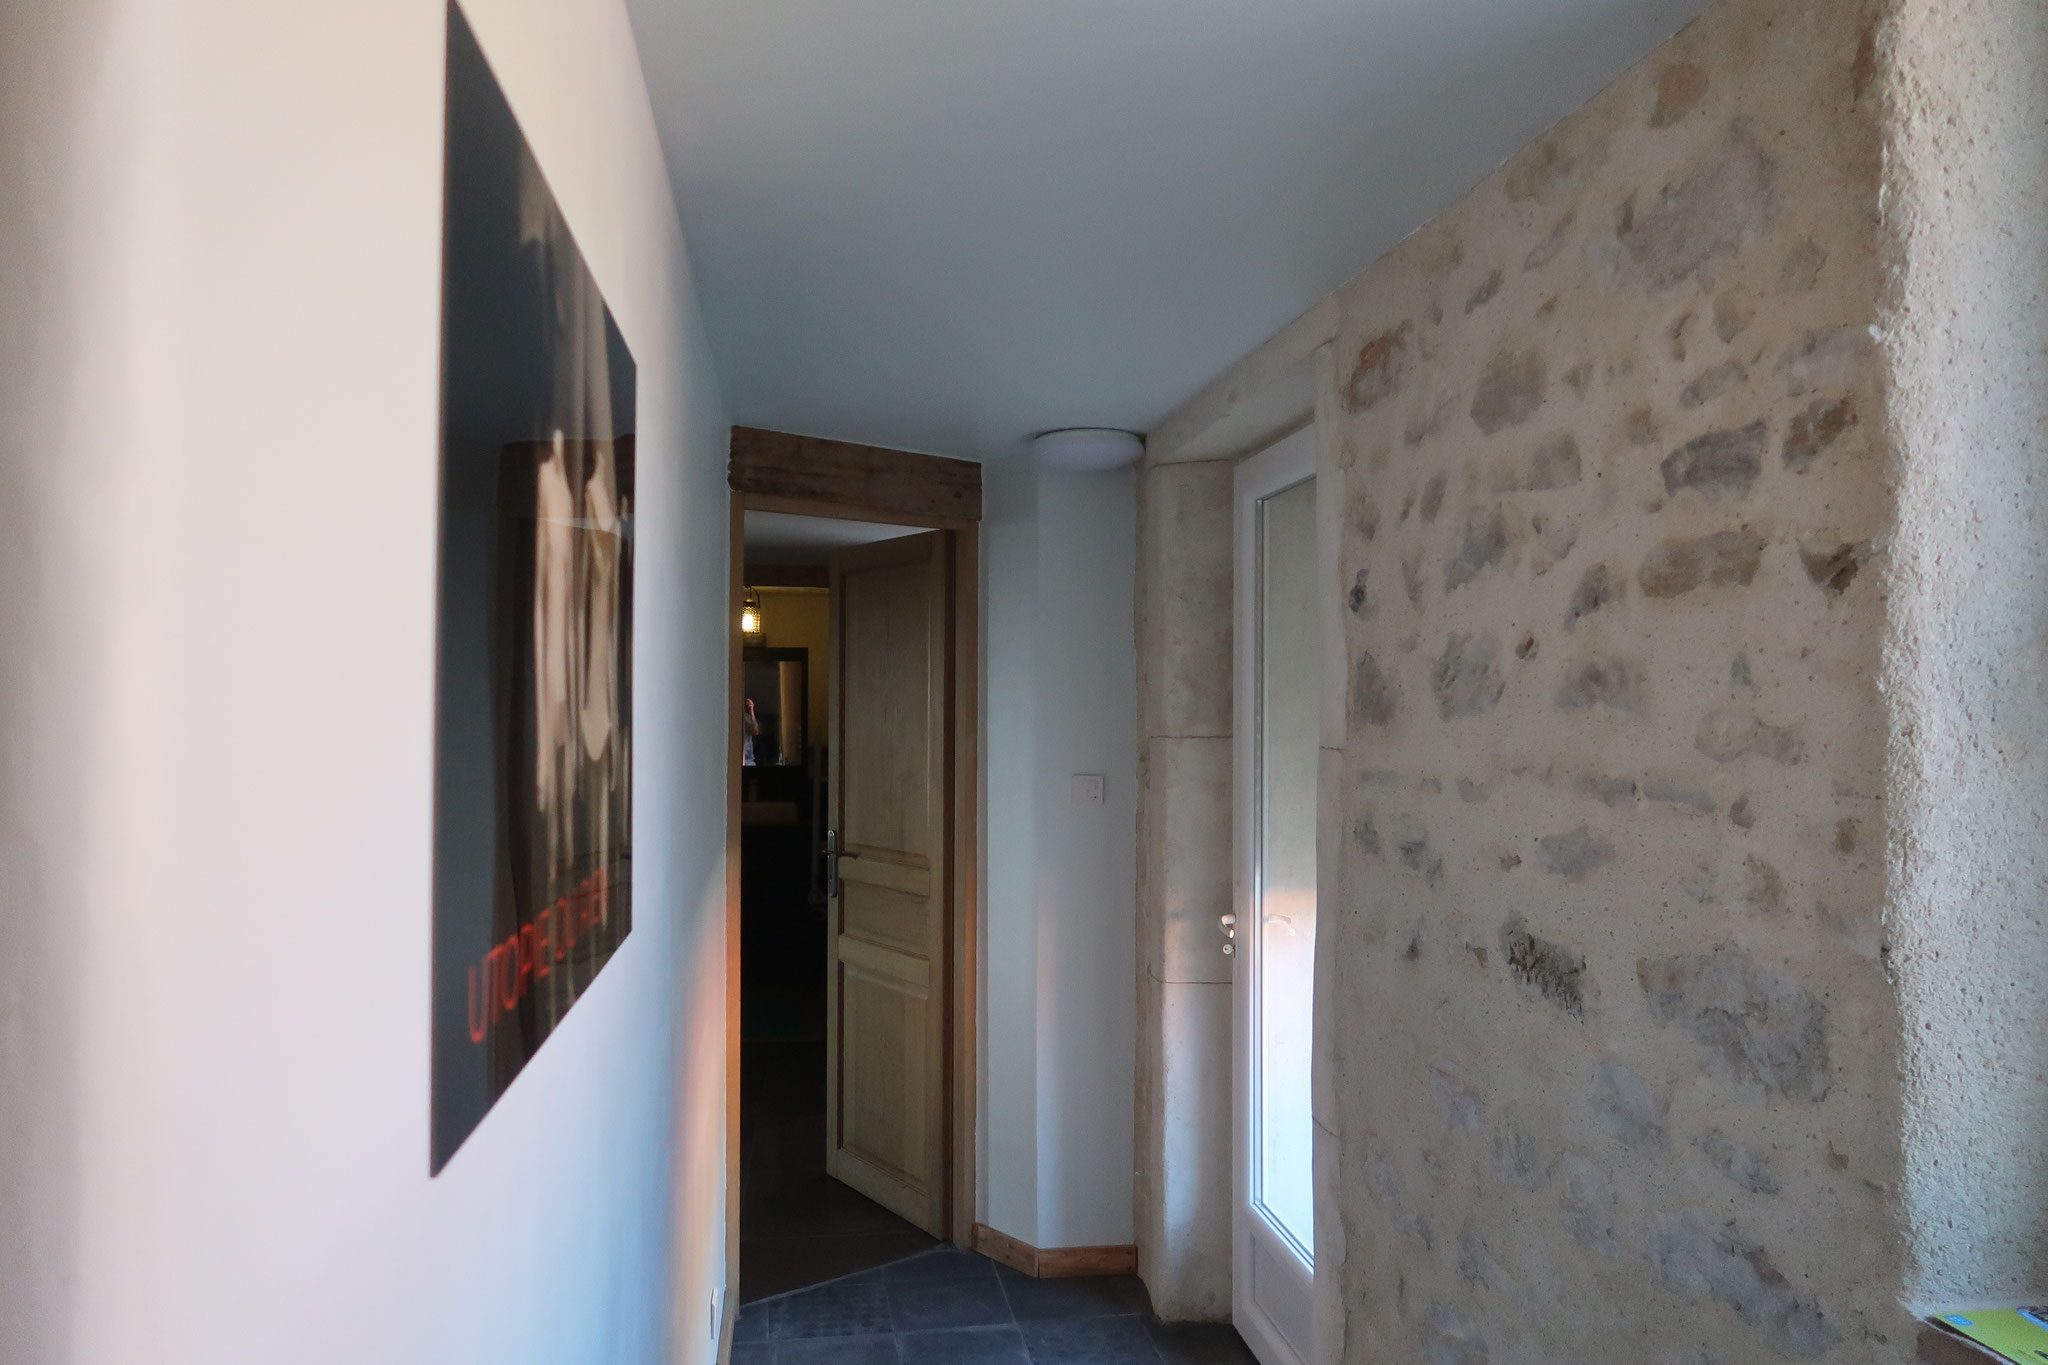 couloir basquiat room